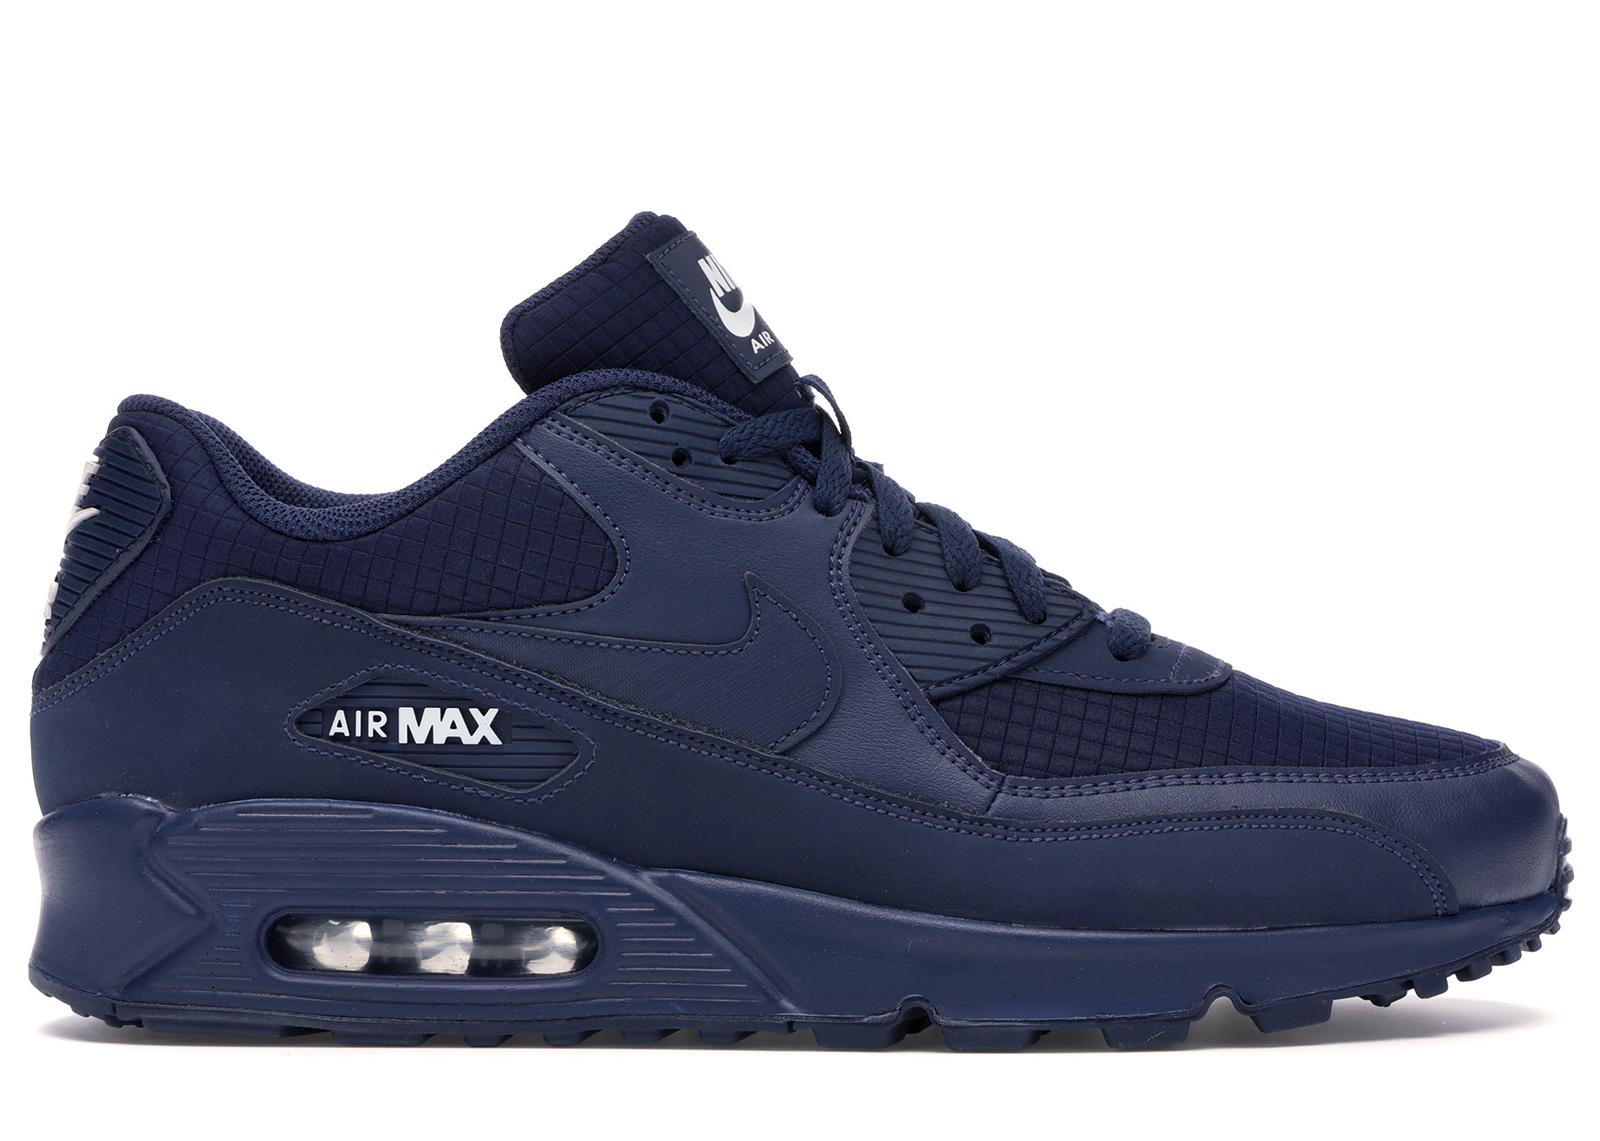 Nike Air Max 90 Midnight Navy - AJ1285-404